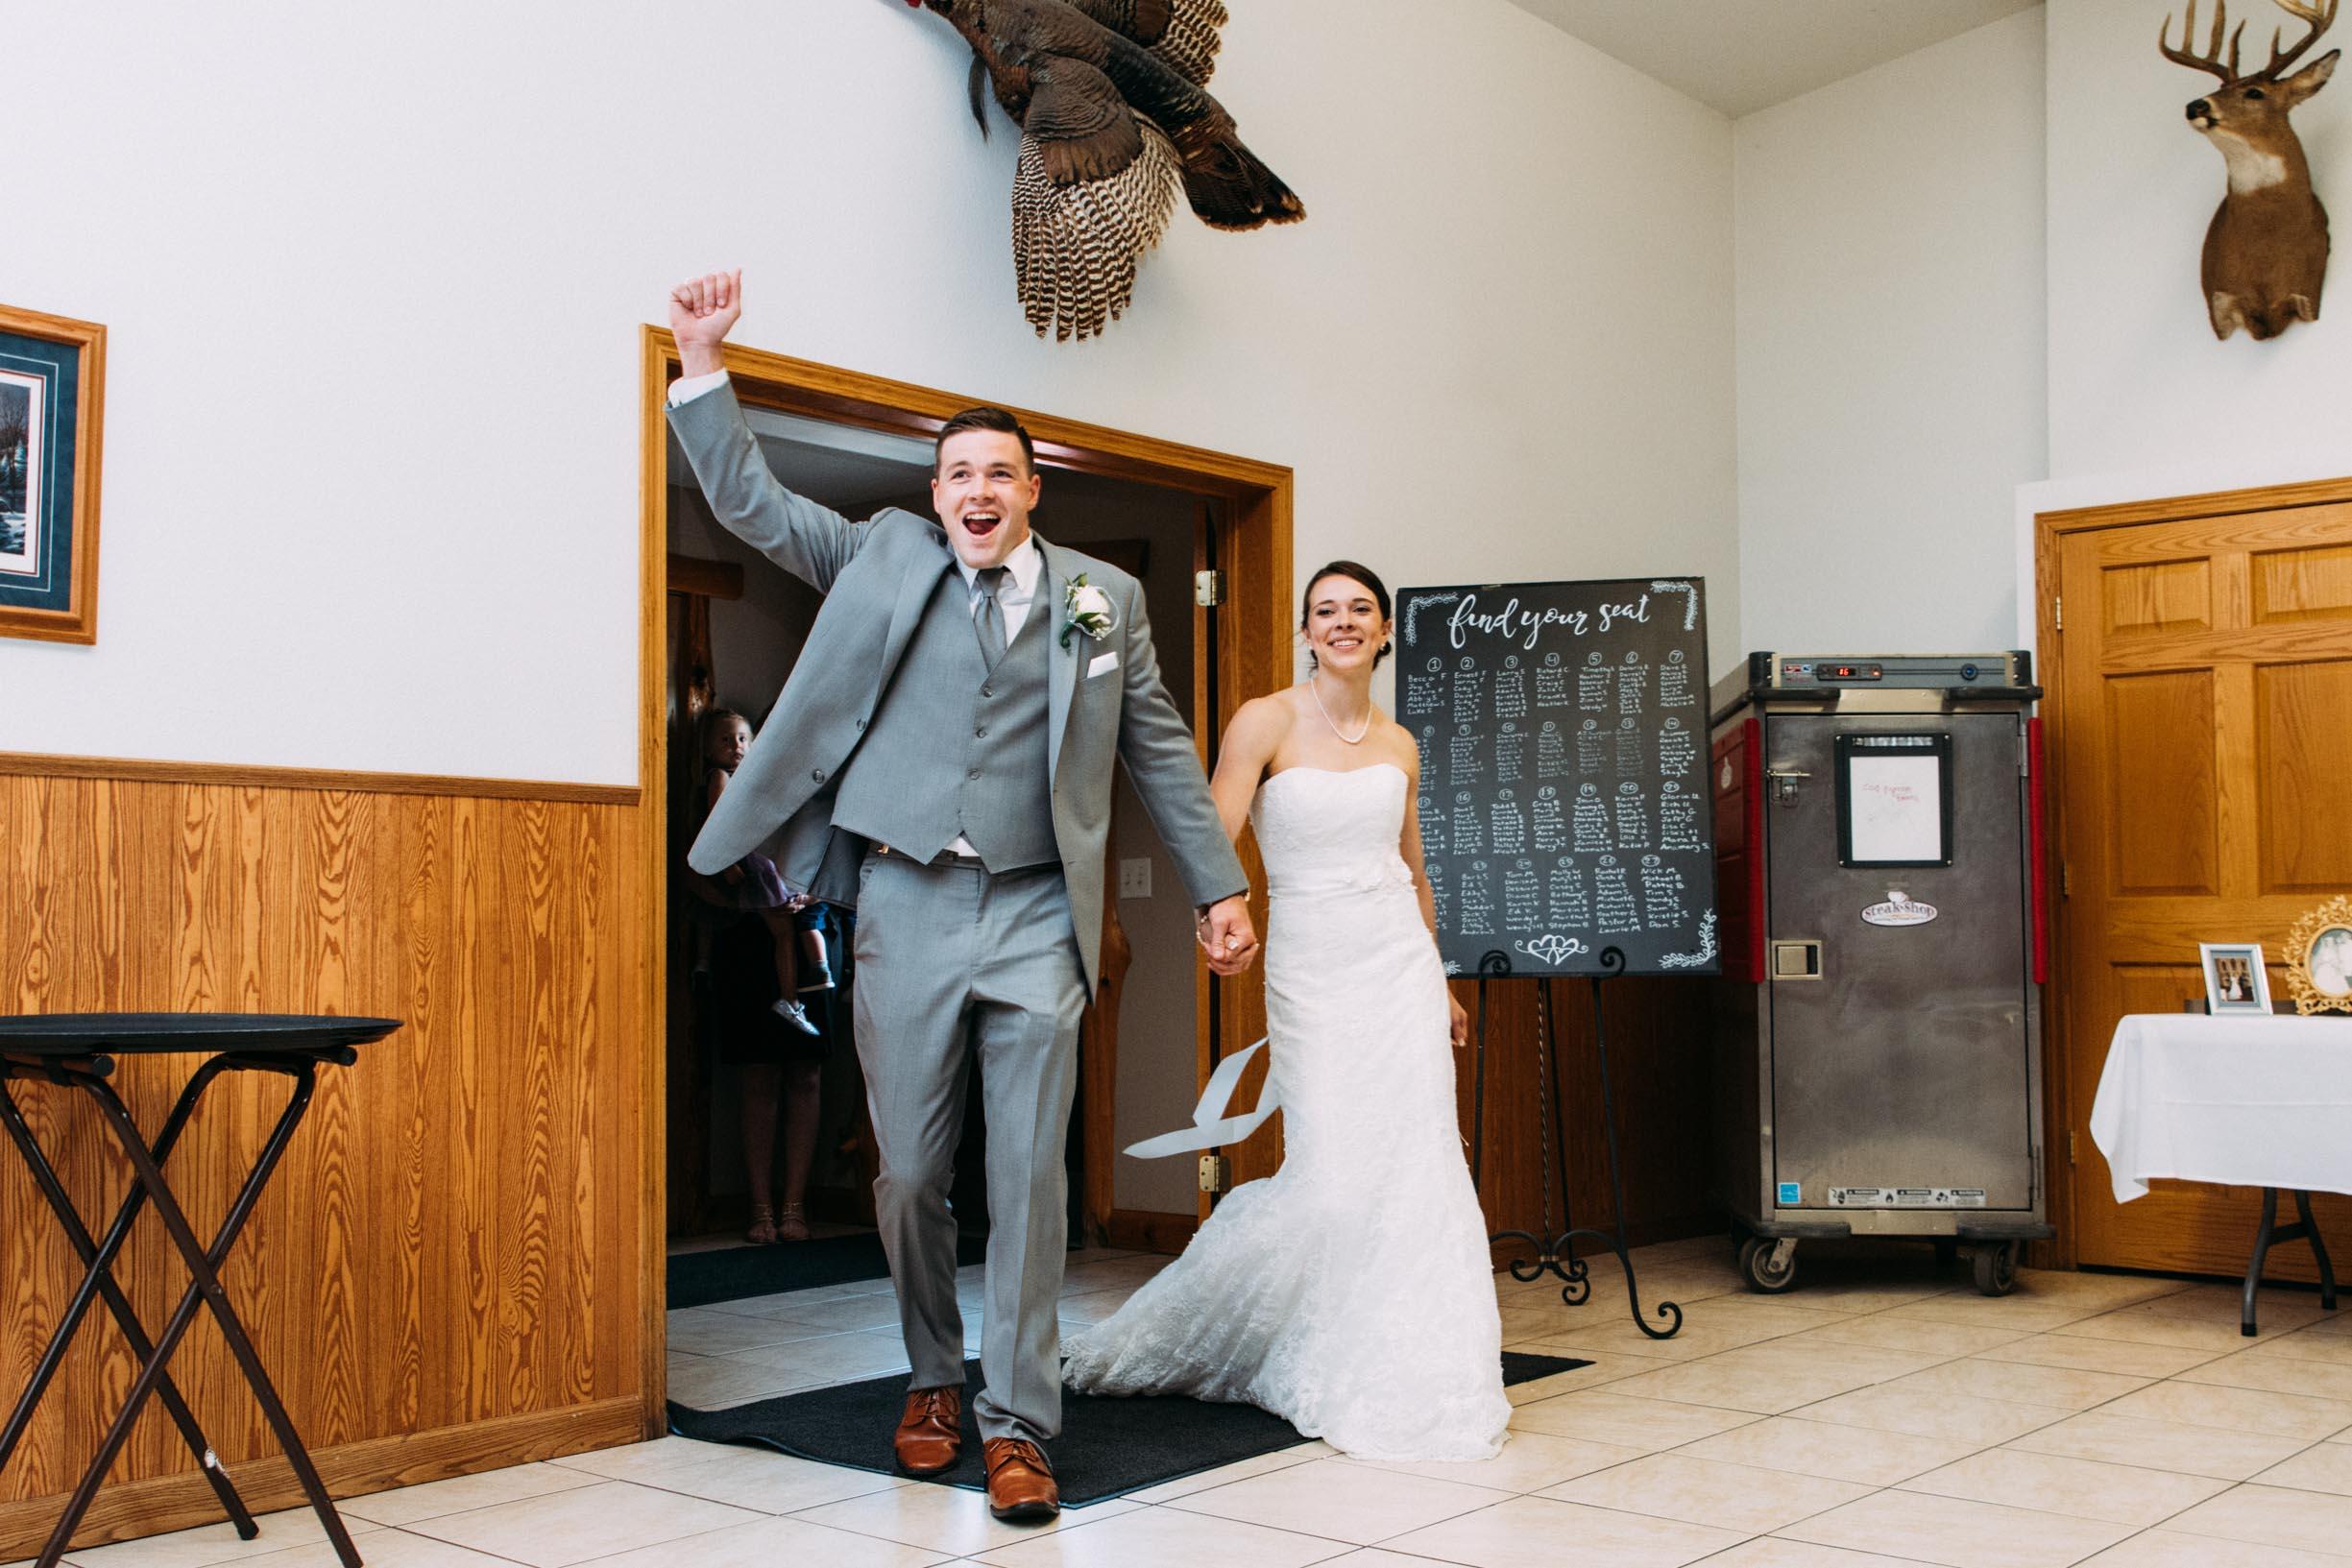 33-Lindsey Jake Wedding Reception Winona_.jpg